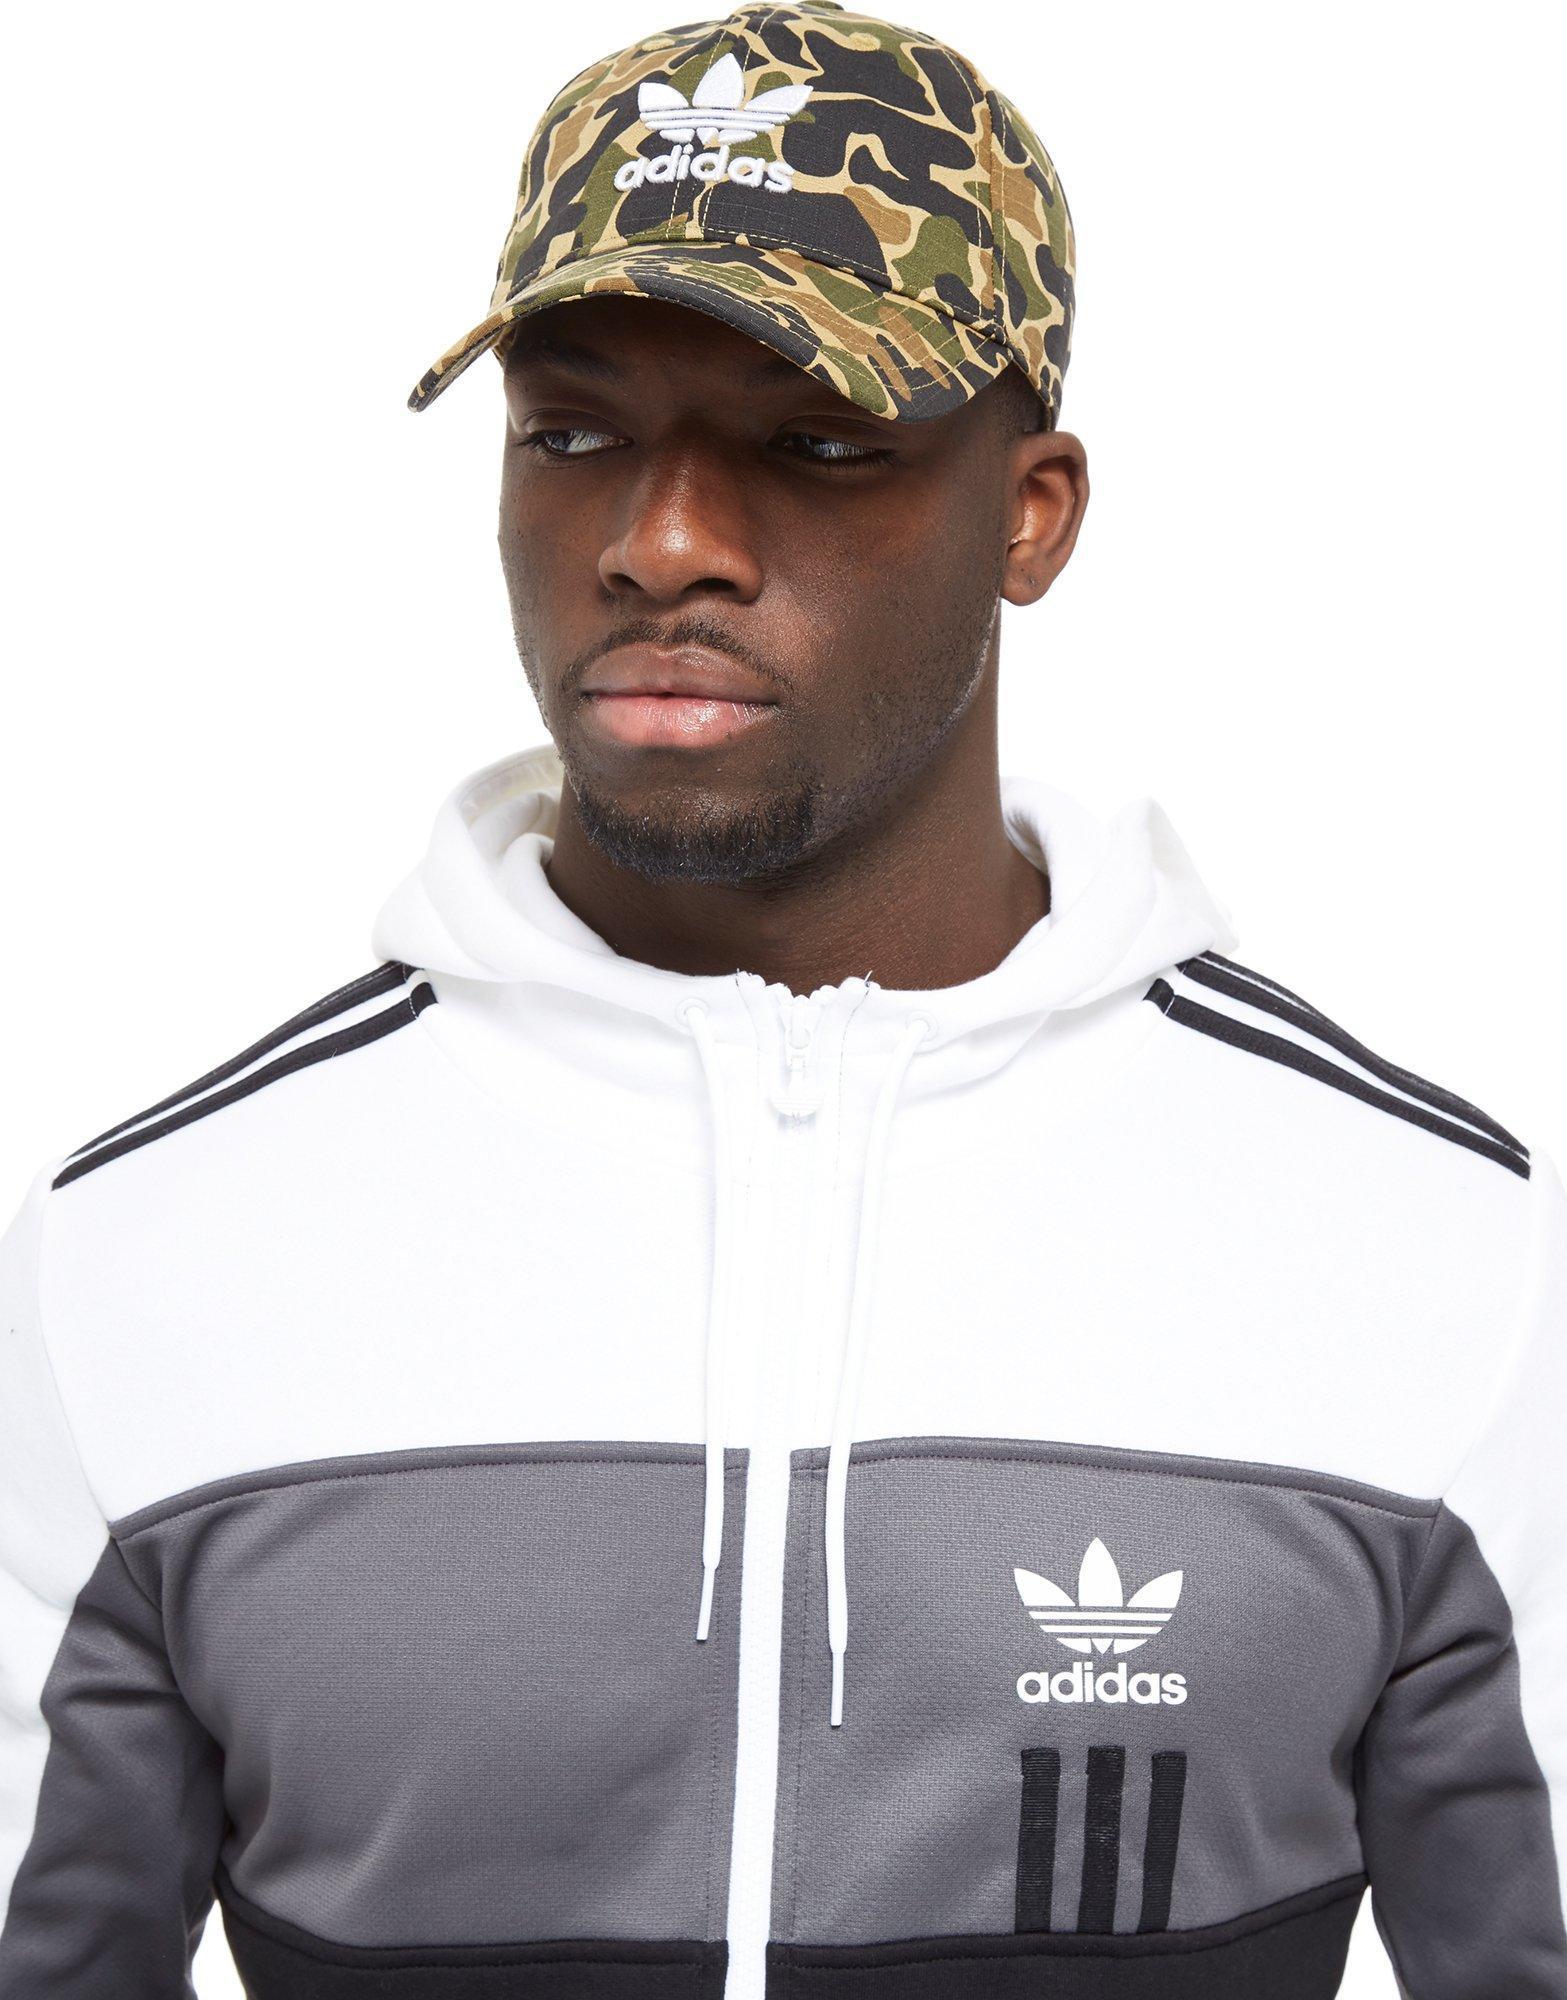 cb2573bc36d Adidas Originals Trefoil Classic Cap in Green for Men - Lyst